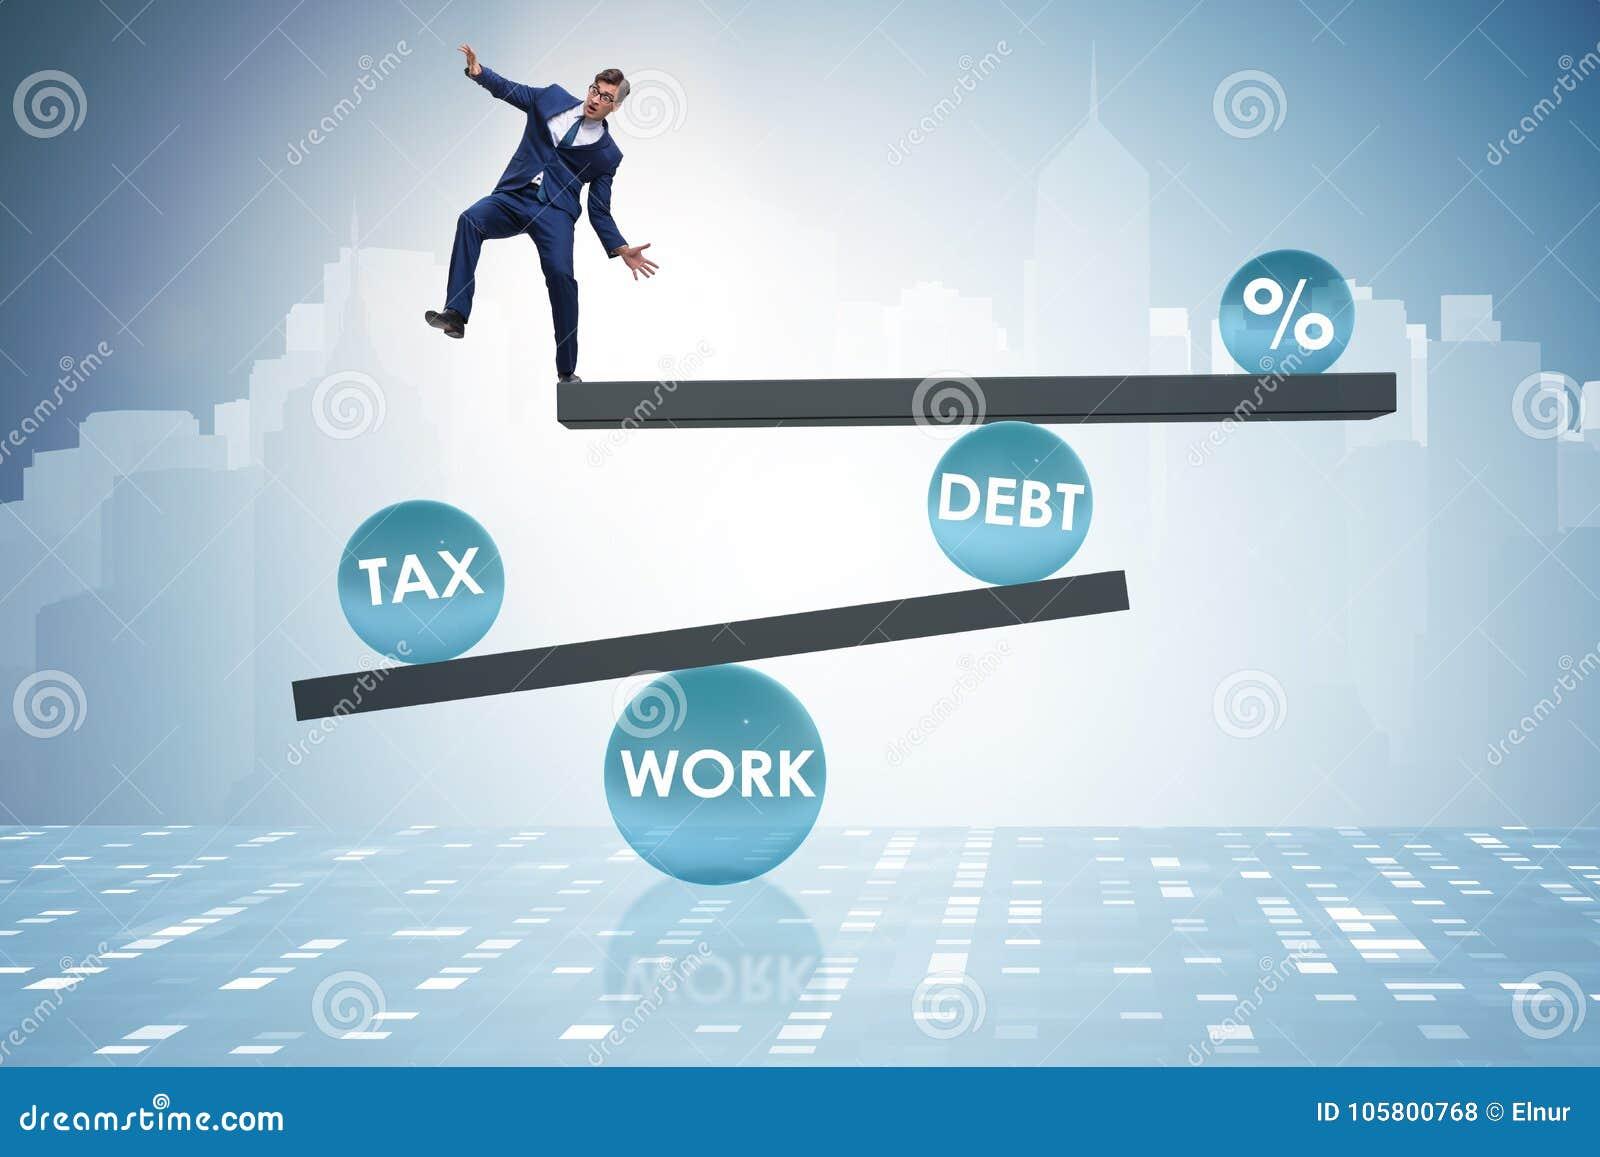 De zakenman in schuld en belastings bedrijfsconcept